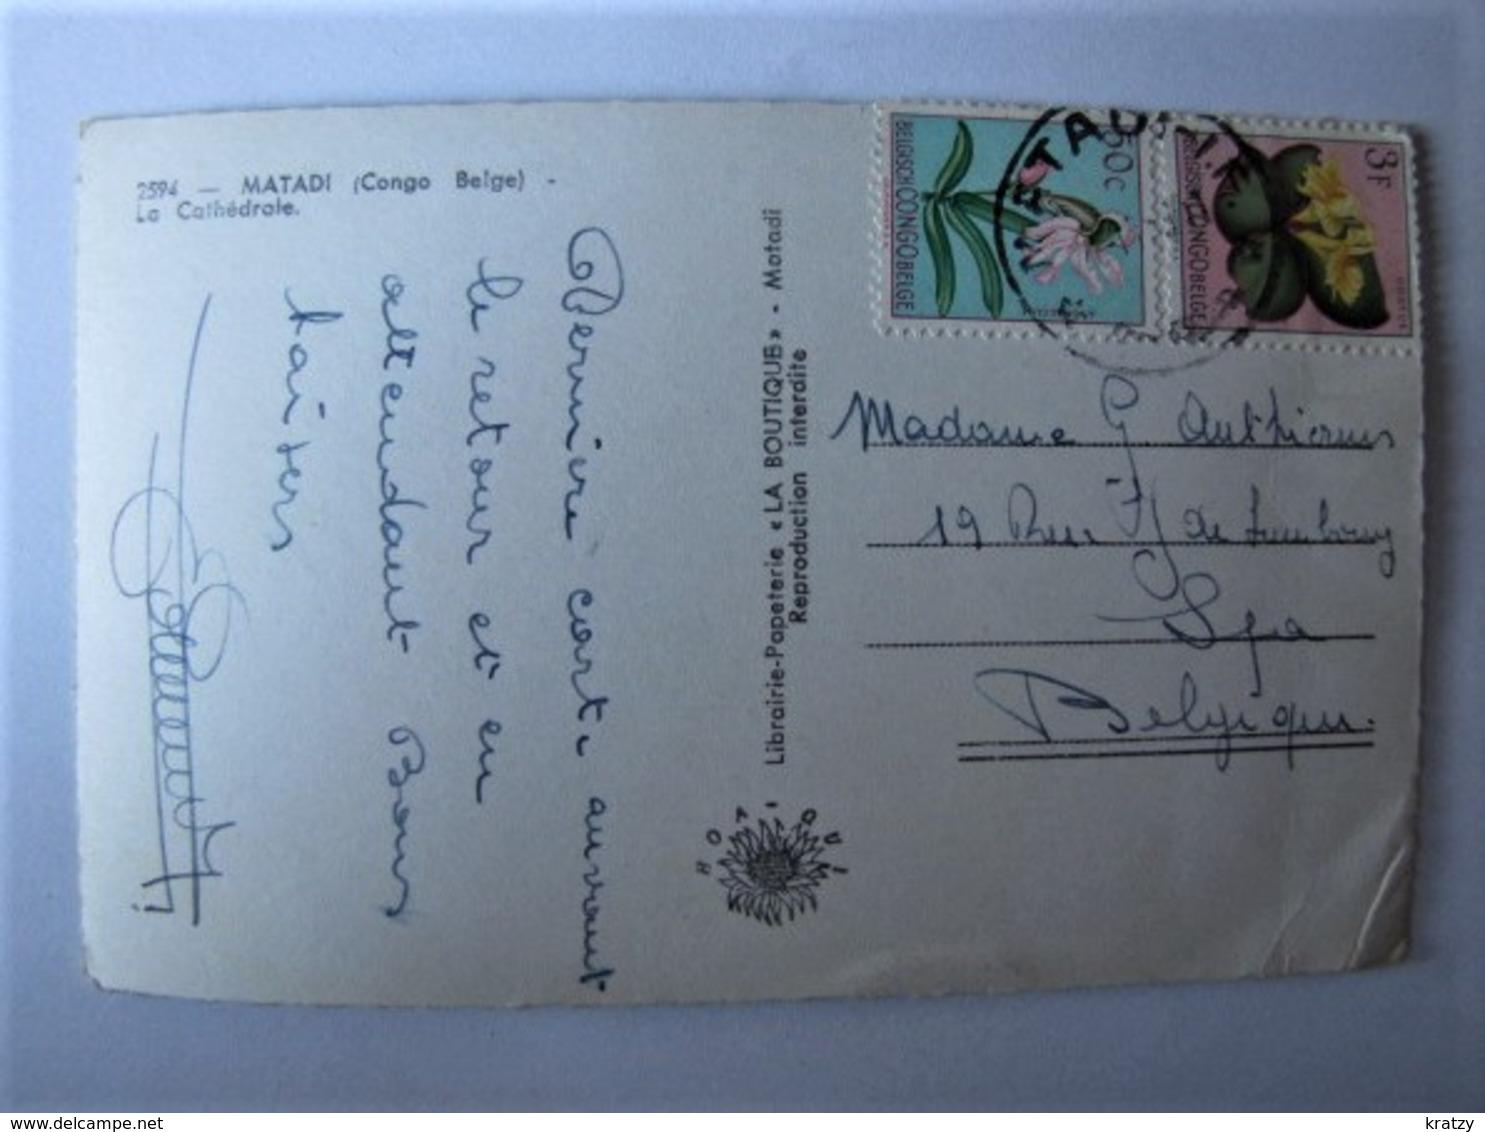 CONGO BELGE - MATADI - La Cathédrale - Congo Belge - Autres